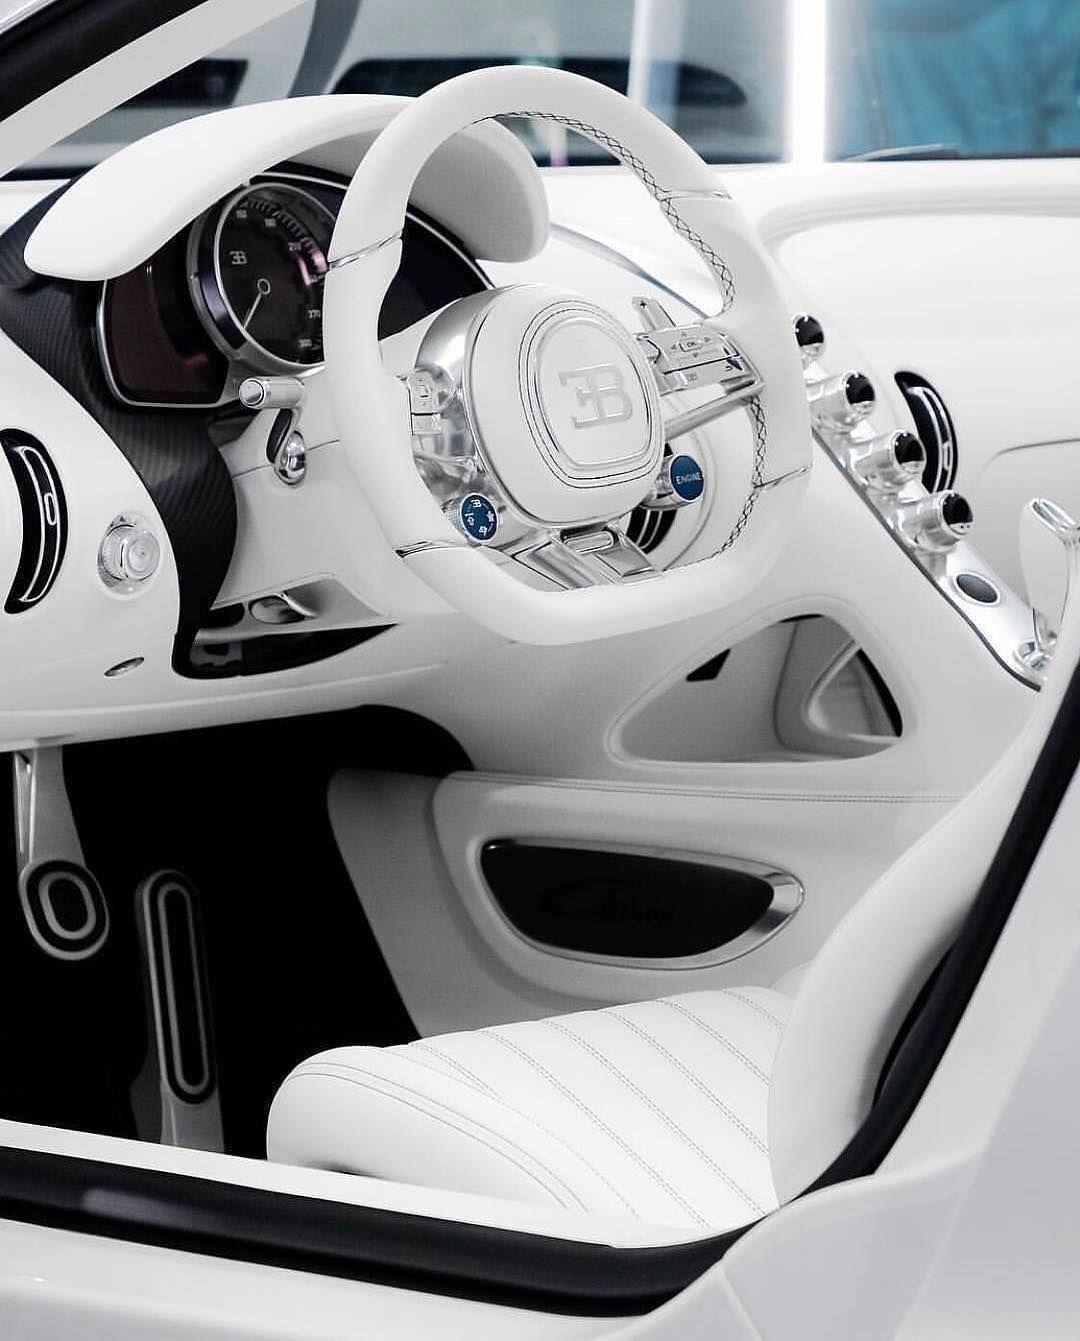 World Of Luxuryz On Instagram Obprestigeauto S Amazing On World Of Luxuryz On Instagram Bugatti Chiron Interior Bugatti Veyron Interior Bugatti Cars